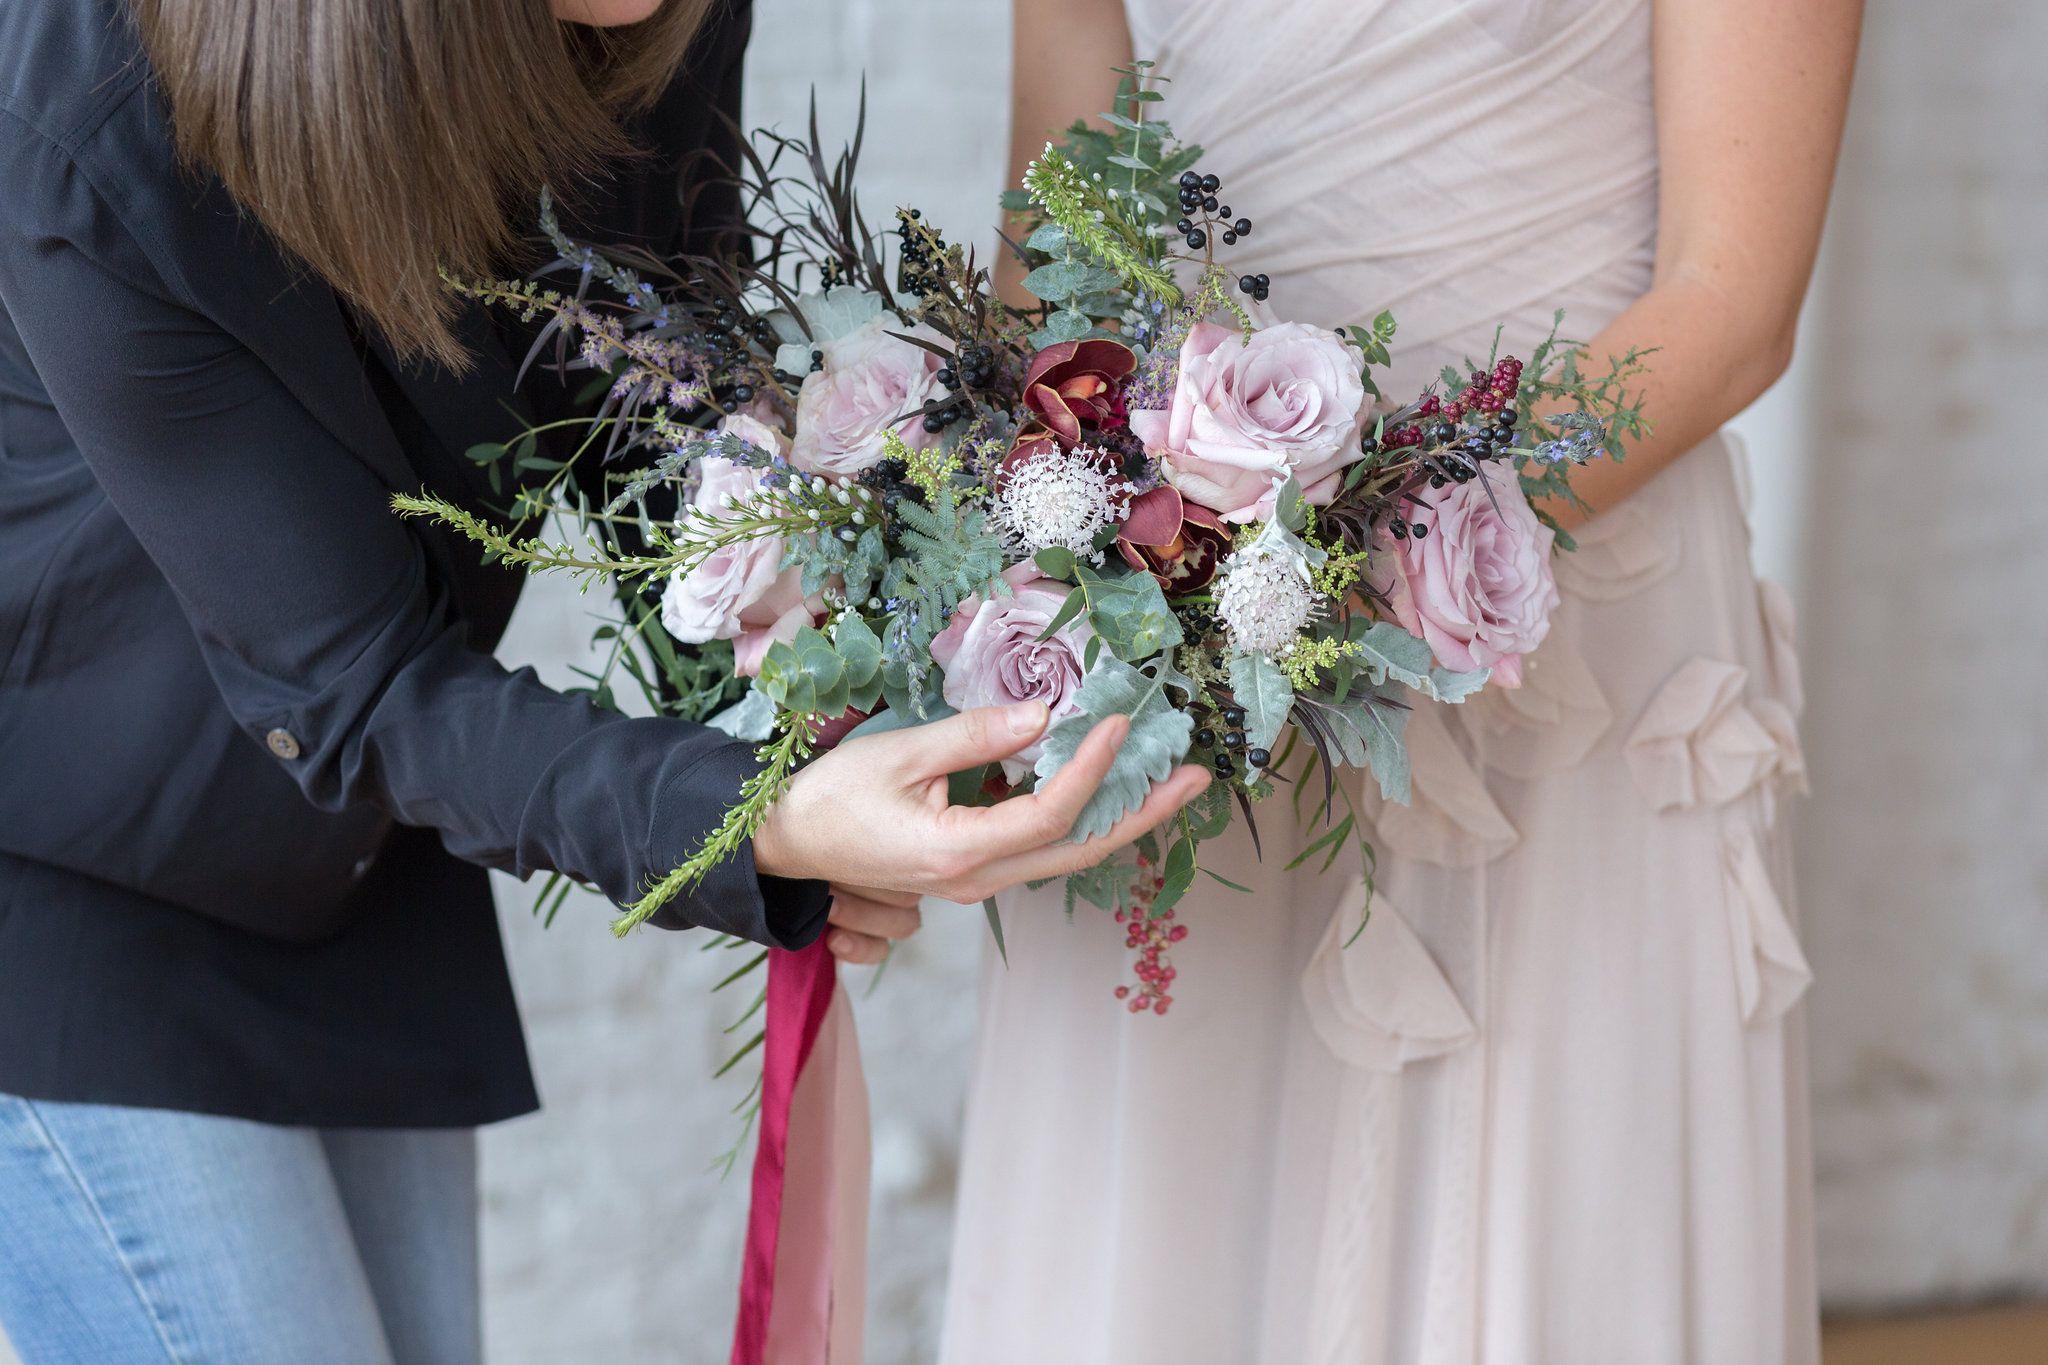 denver wedding florist, la rue floral, floral studio